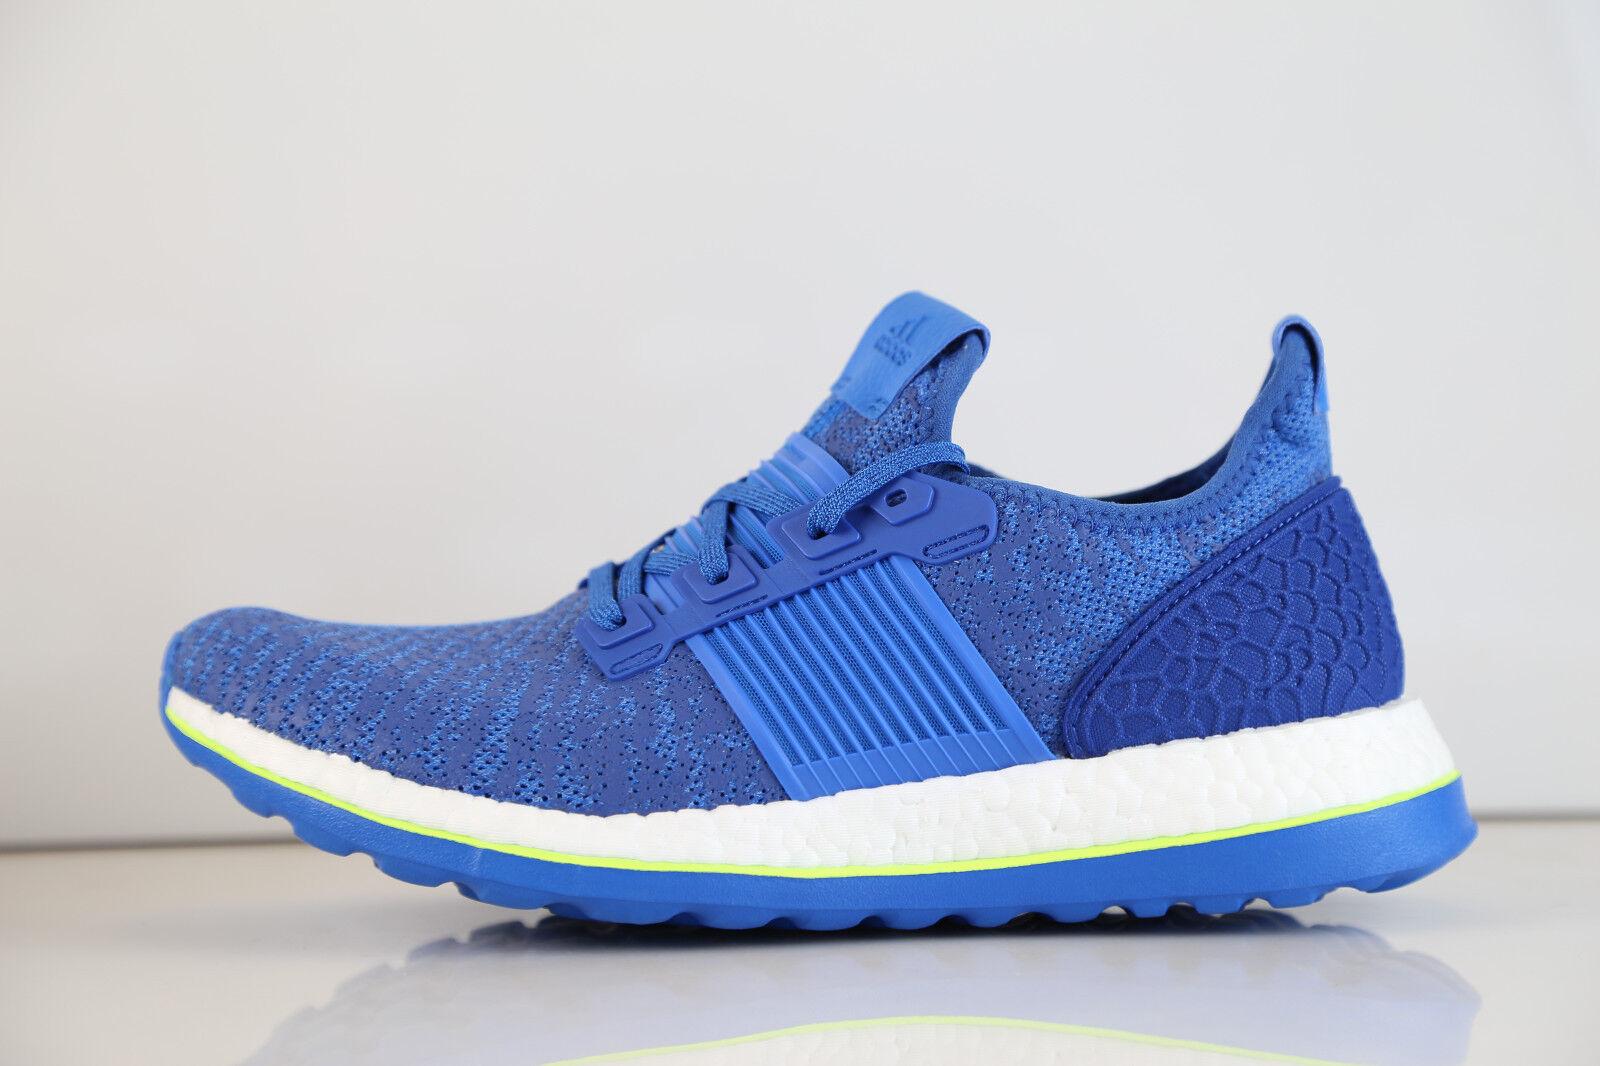 Adidas Pure Boost ZG primer M Azul aq2929 ultra Mesh PK NMD 1 8 12